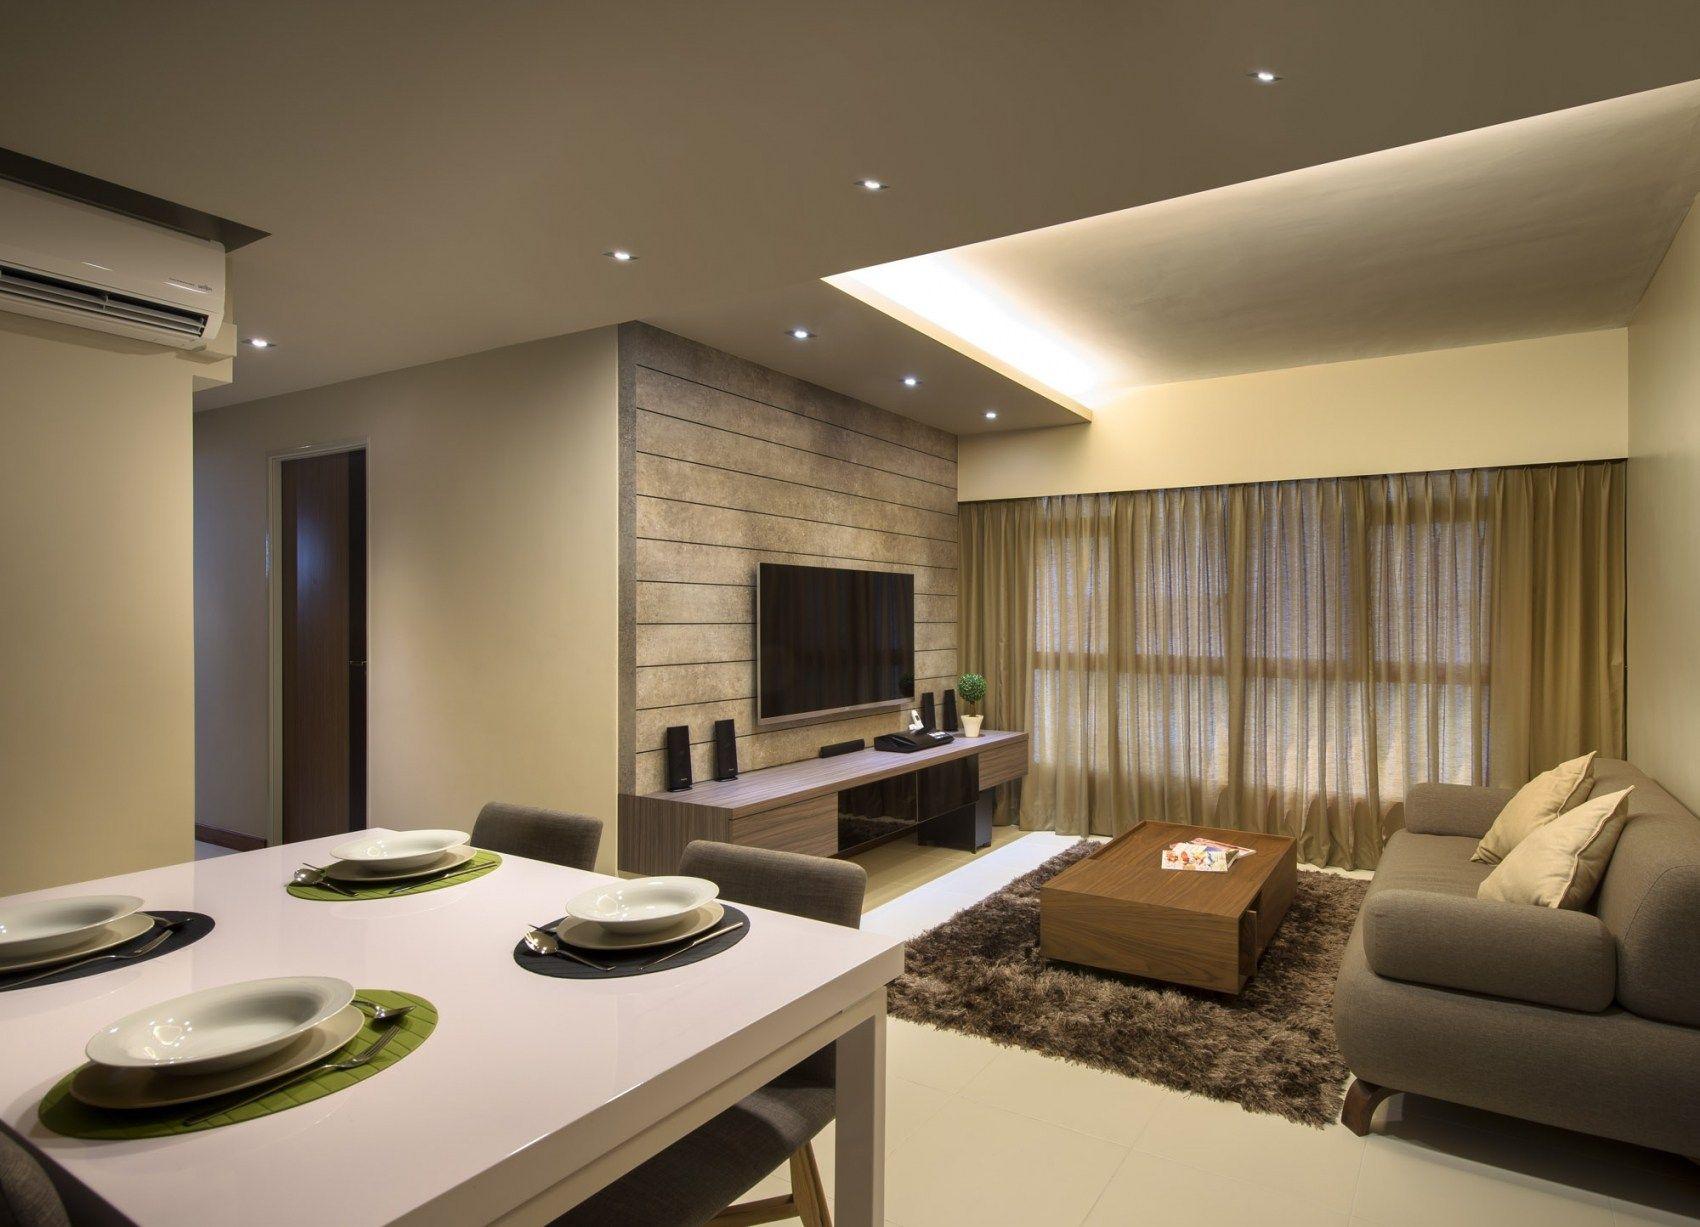 Top 10 Interior Design Ideas 4 Room Hdb Top 10 Interior Design Ideas ...